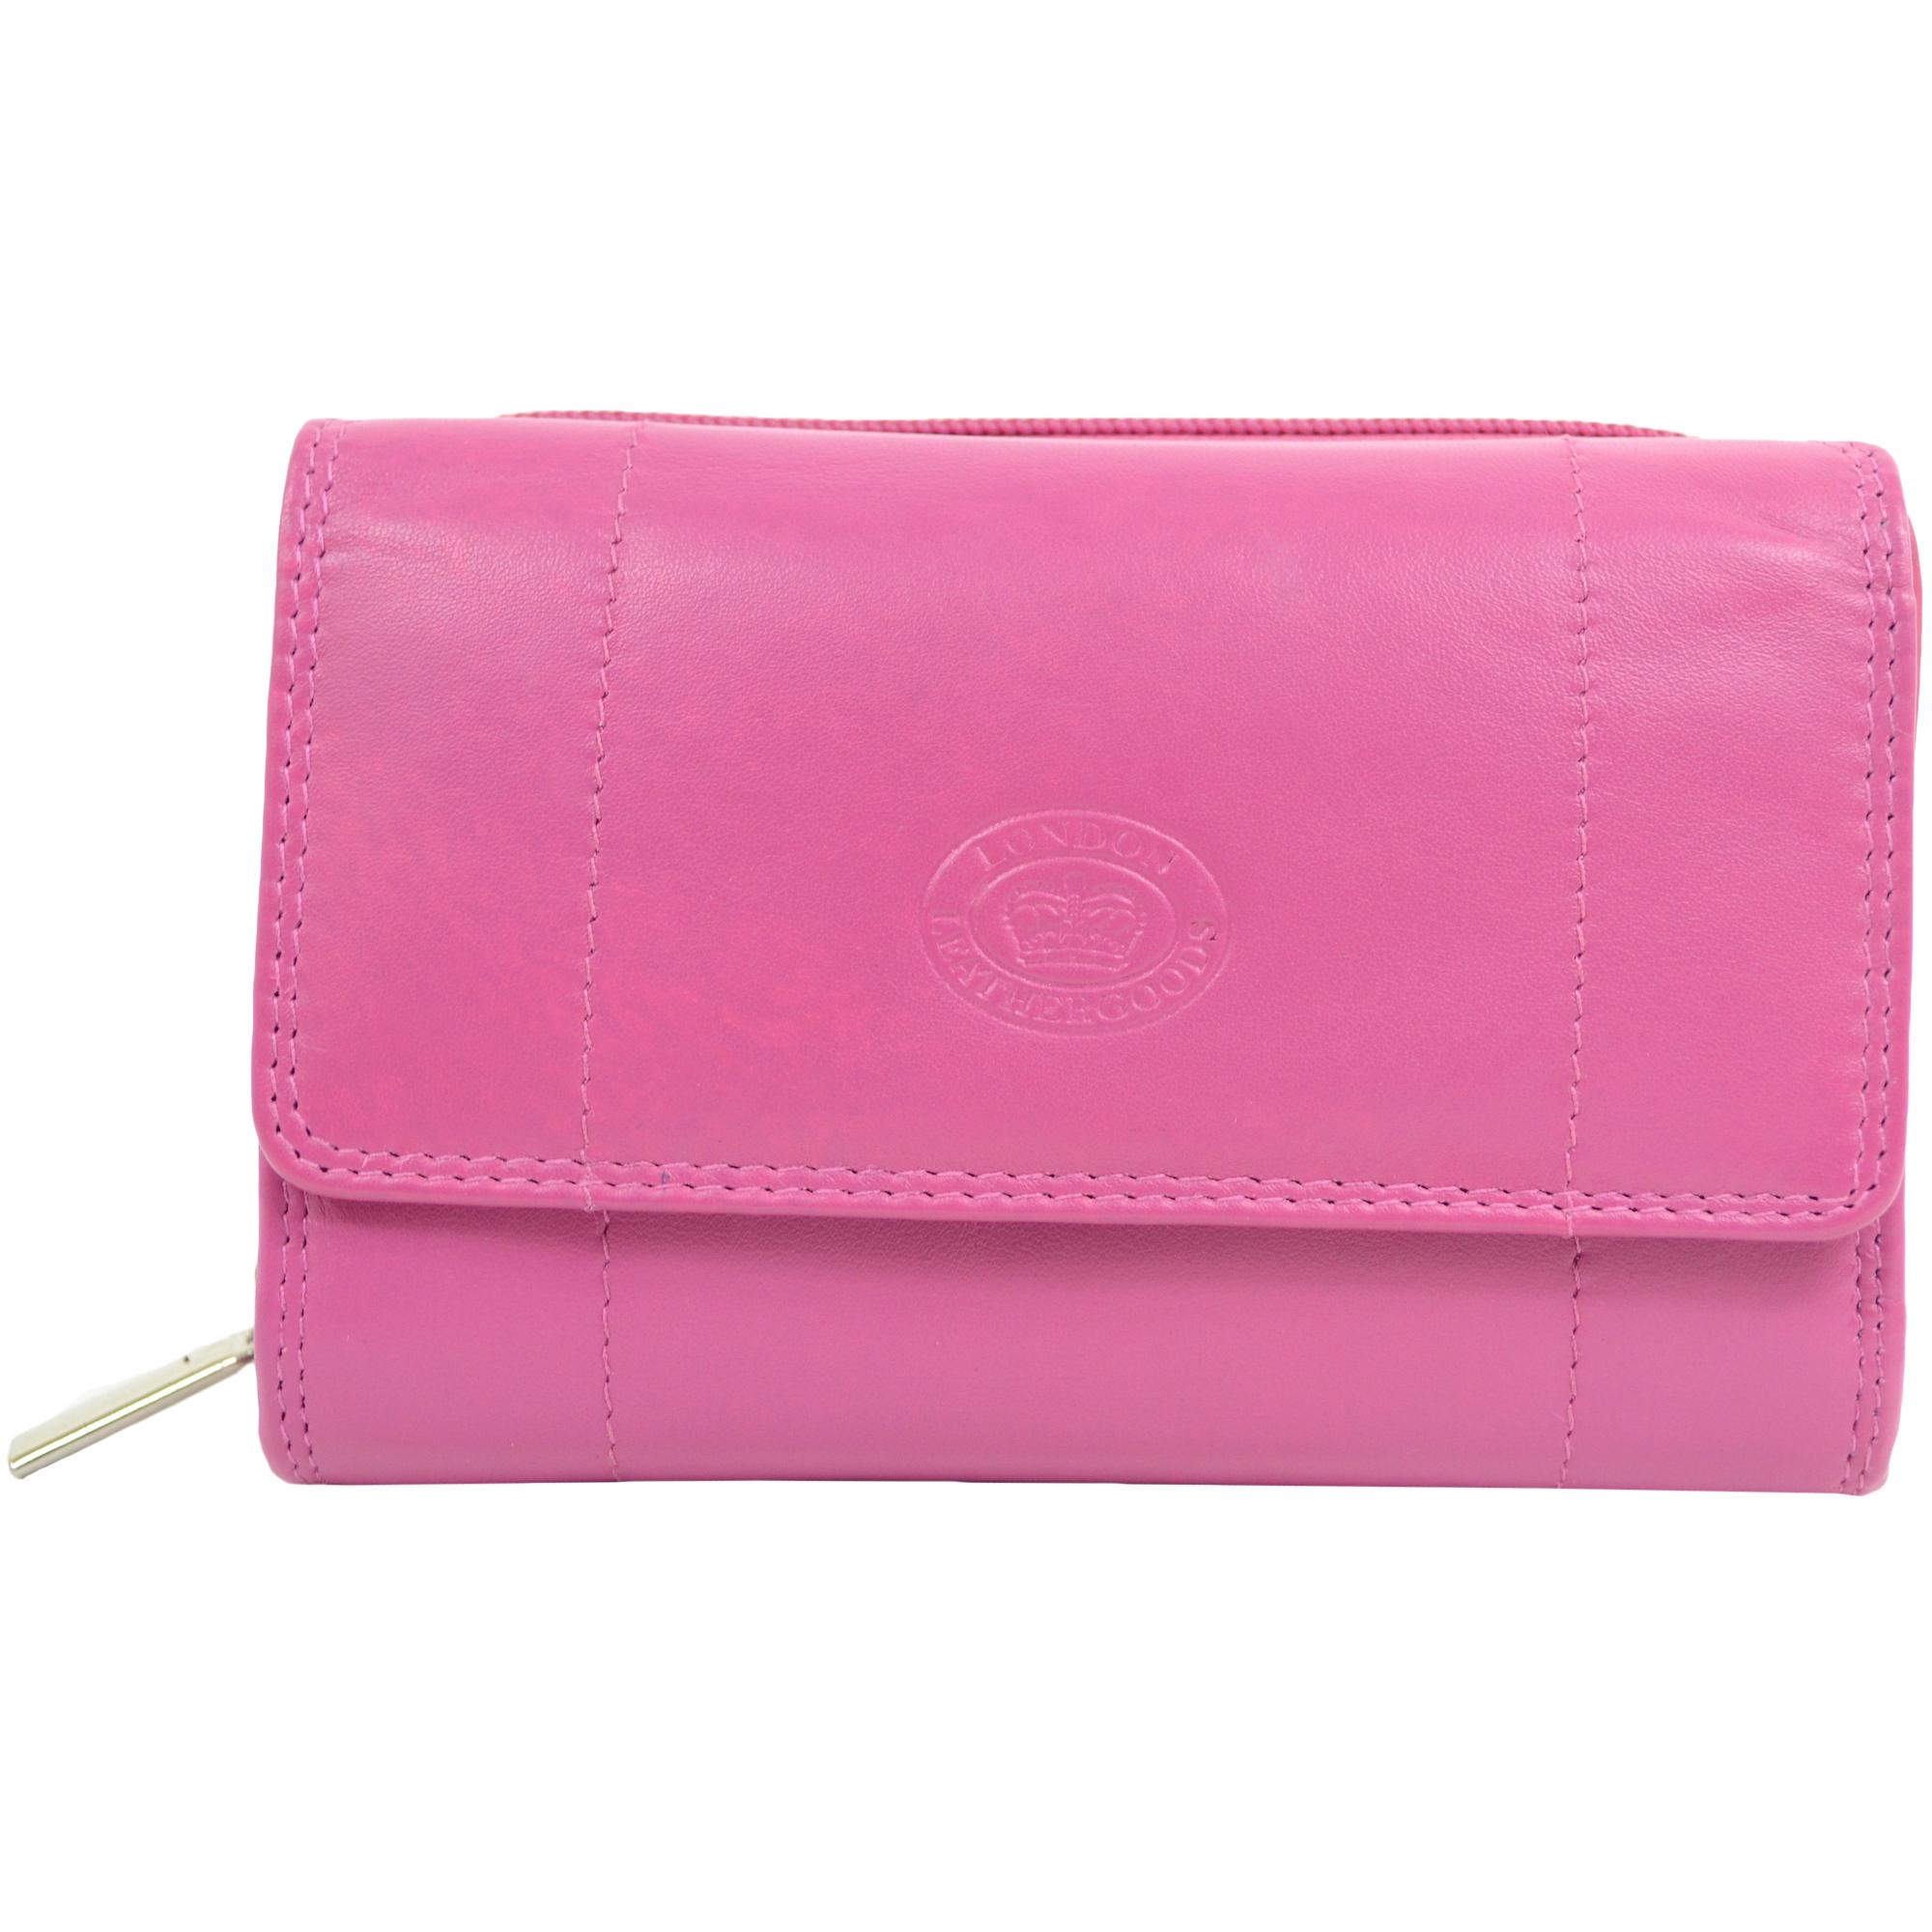 Soft Nappa Leather Zip-Around Purse